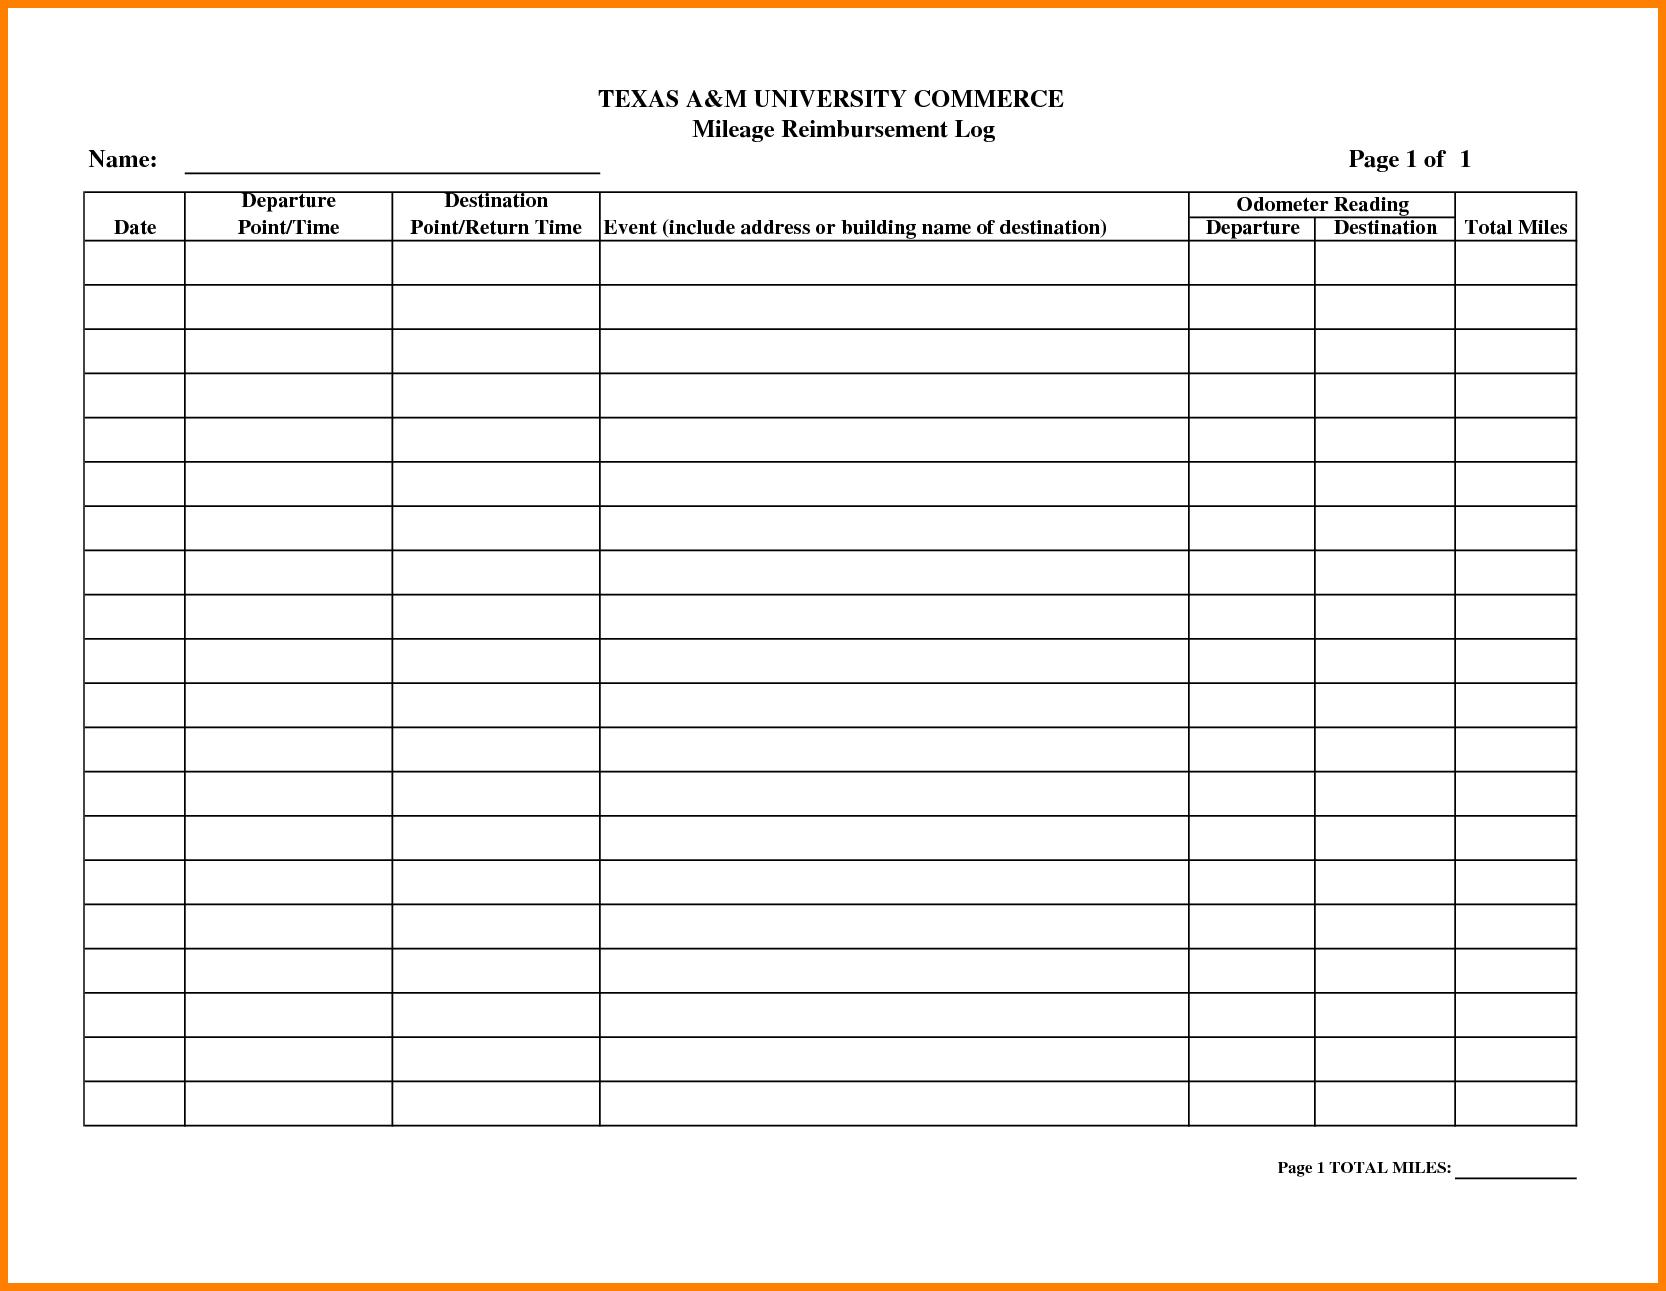 Mileage Reimbursement Spreadsheet With Free Mileage Reimbursement Form Template Unforgettable Templates